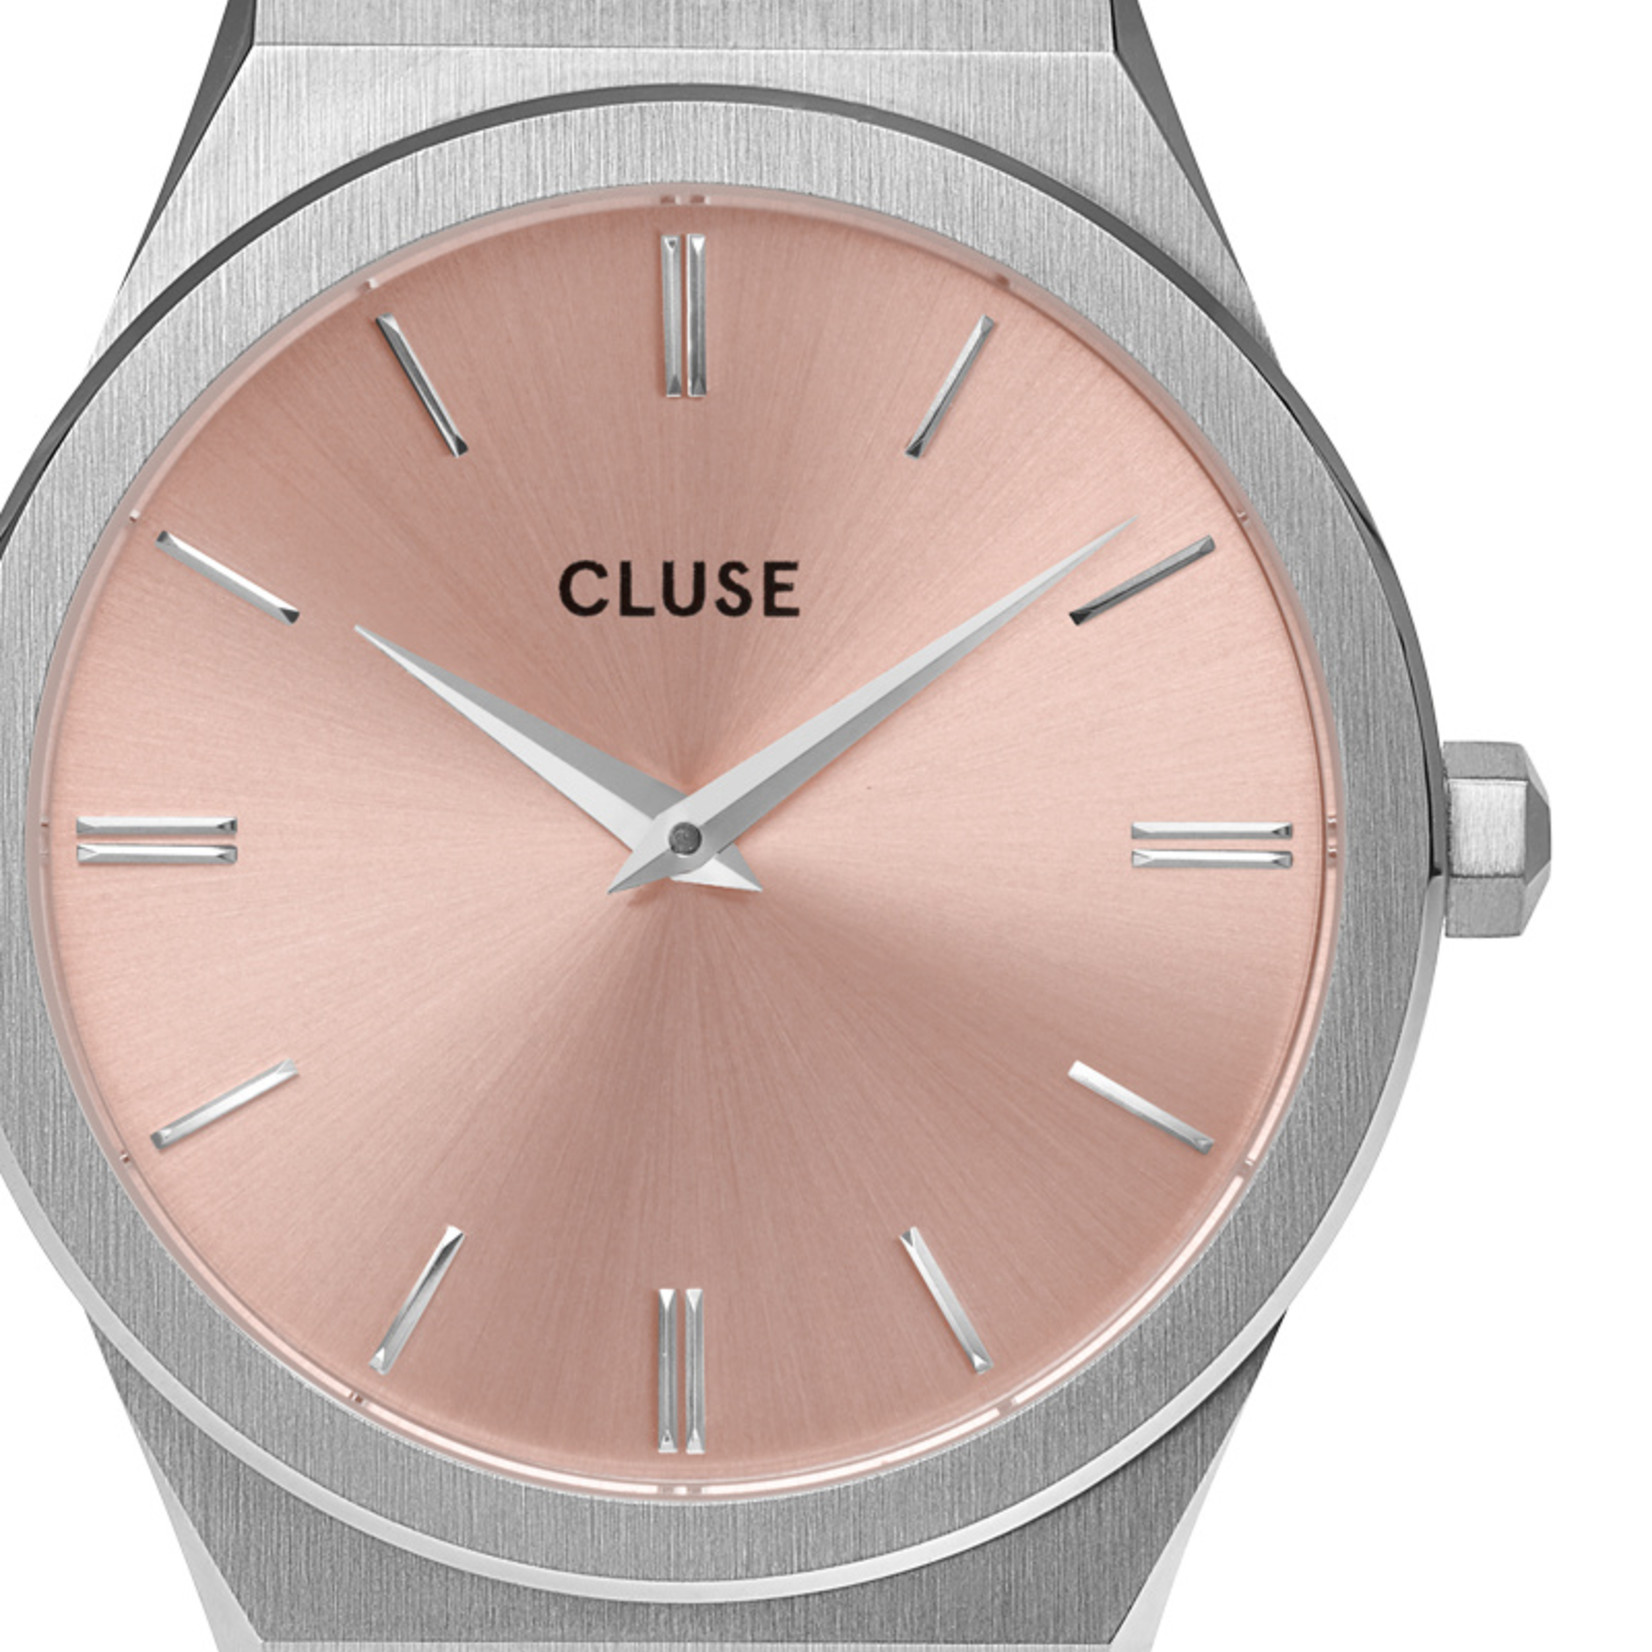 Cluse Cluse Uhr Vigoureux by Katharina I Edelstahl I silber-rosa